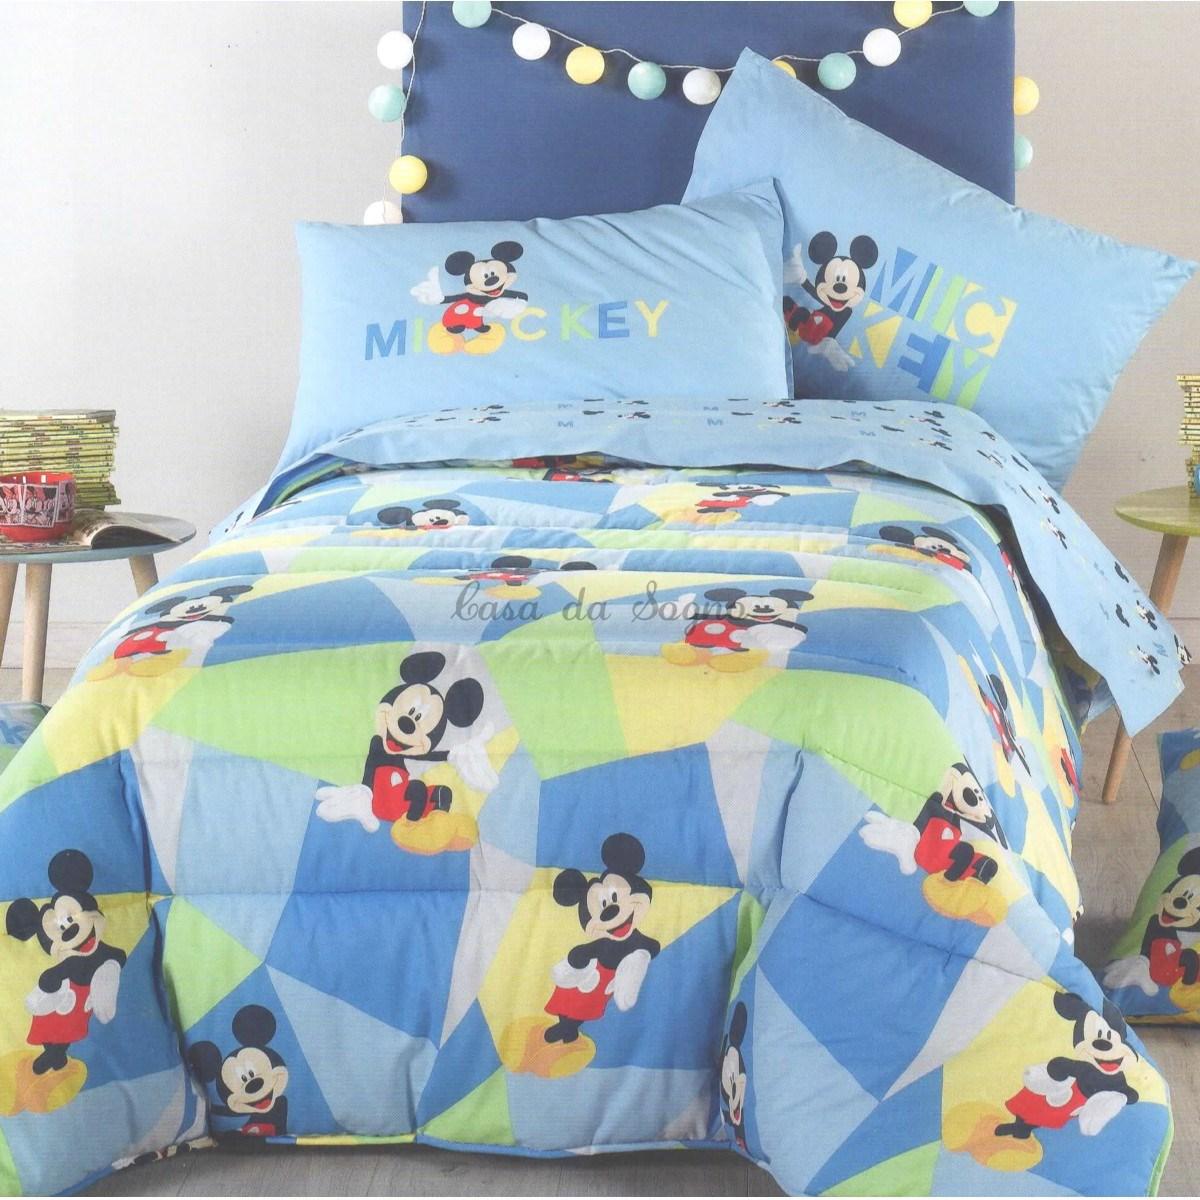 Piumone Principesse Disney Caleffi.Trapunta Topolino Disney Caleffi Singola Mickey Boys Casadasogno